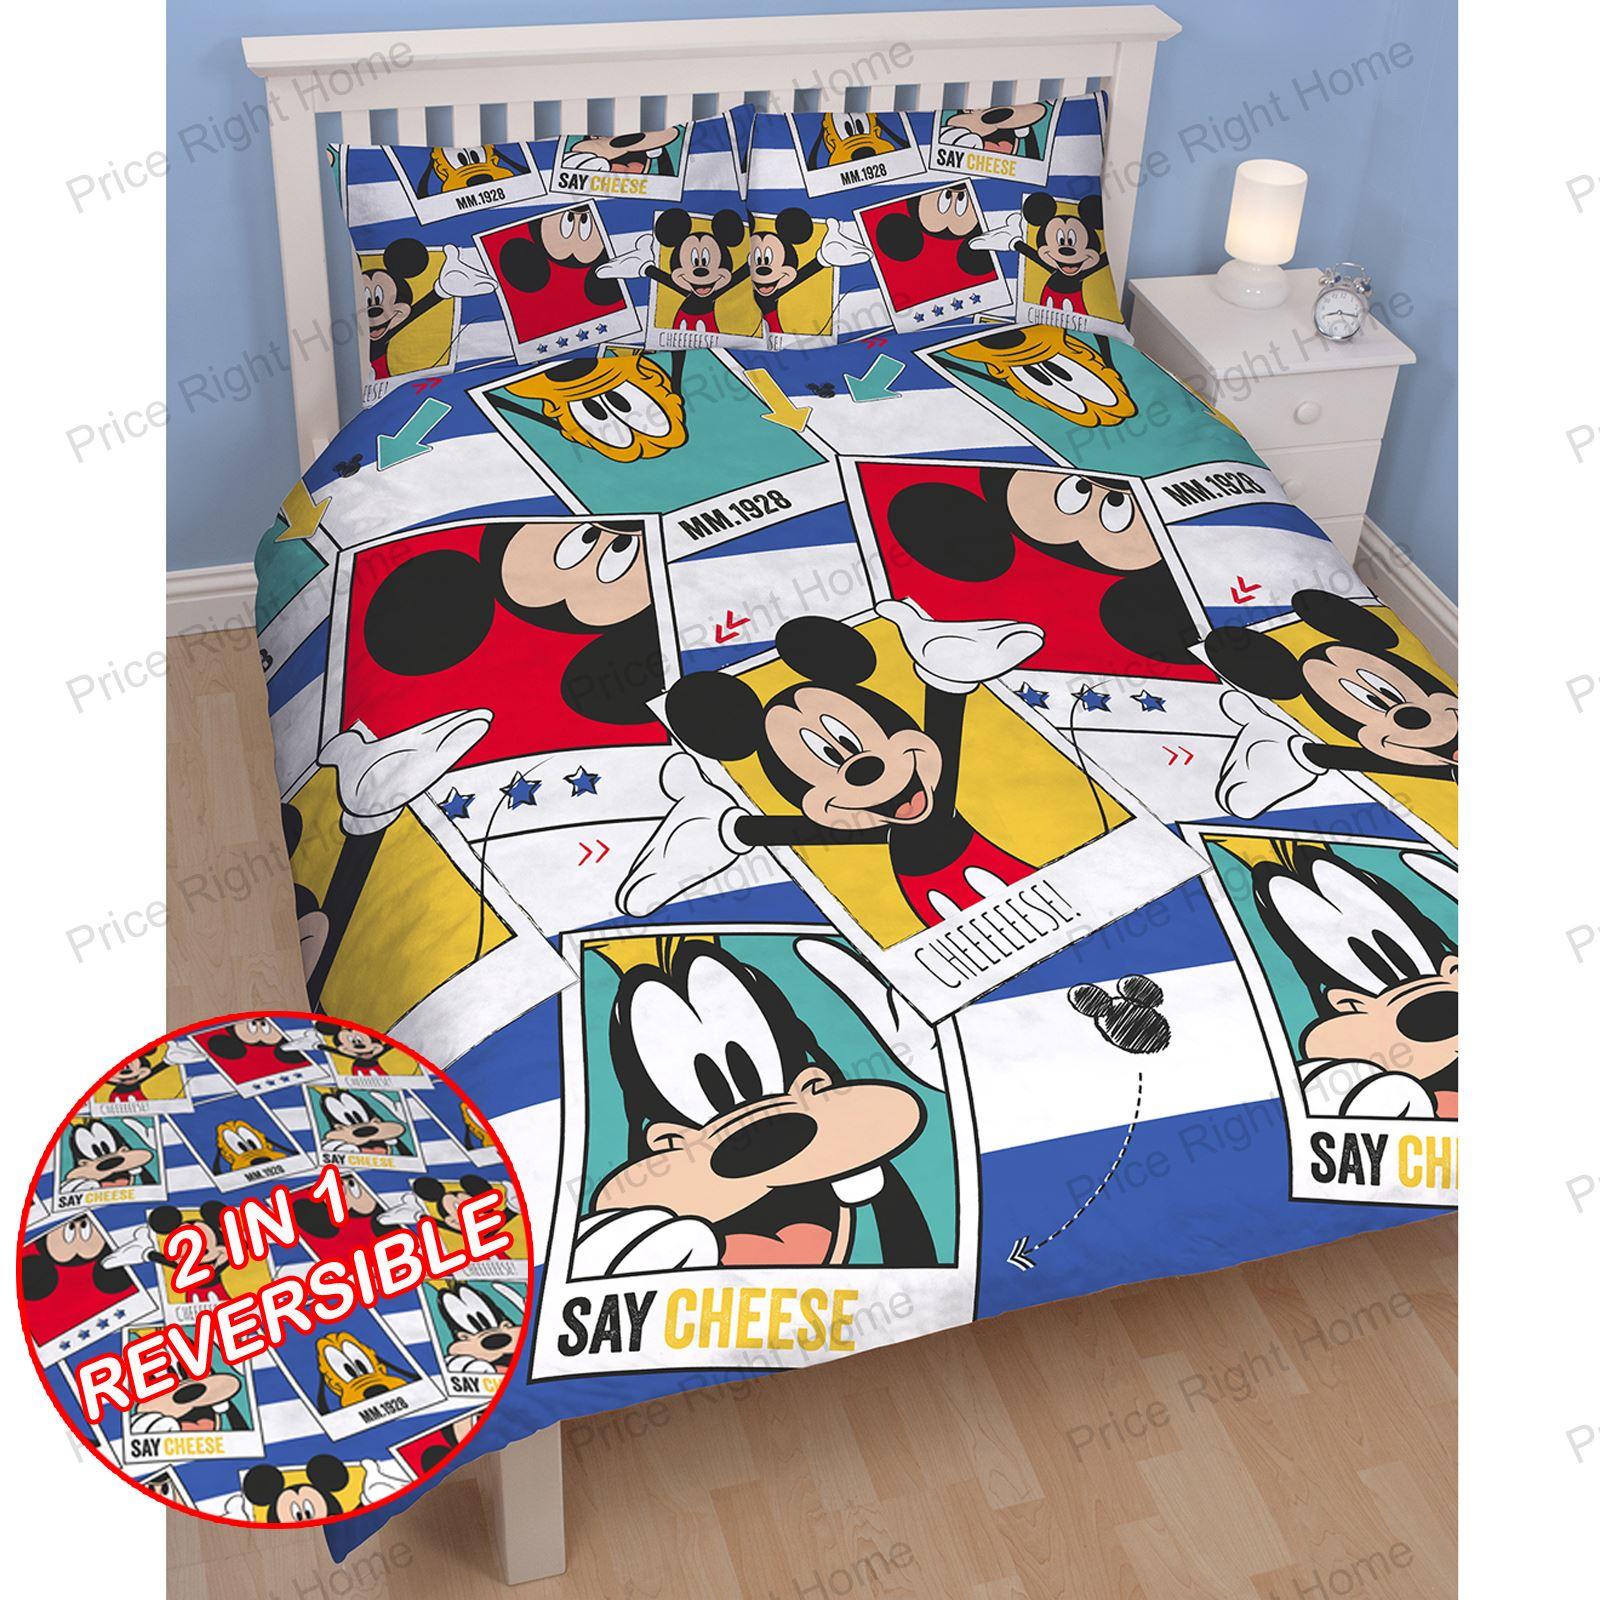 kinder diesney charakter doppelbett bettw sche sets marvel paw patrol emoji ebay. Black Bedroom Furniture Sets. Home Design Ideas